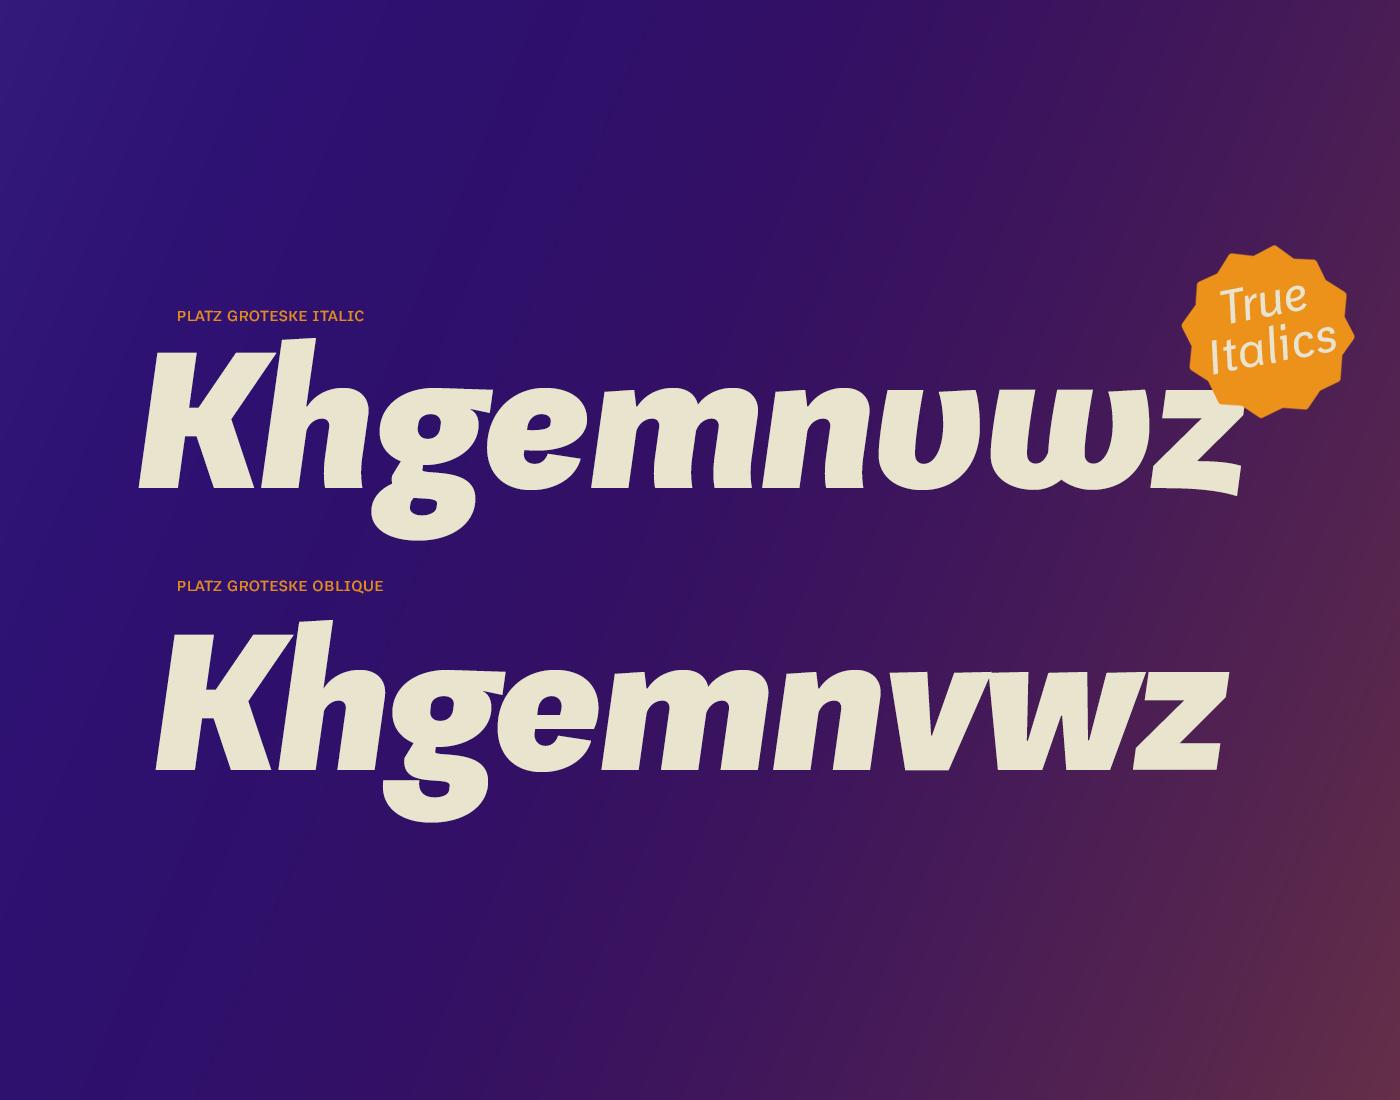 PlatzGrotesk_typography_11.png